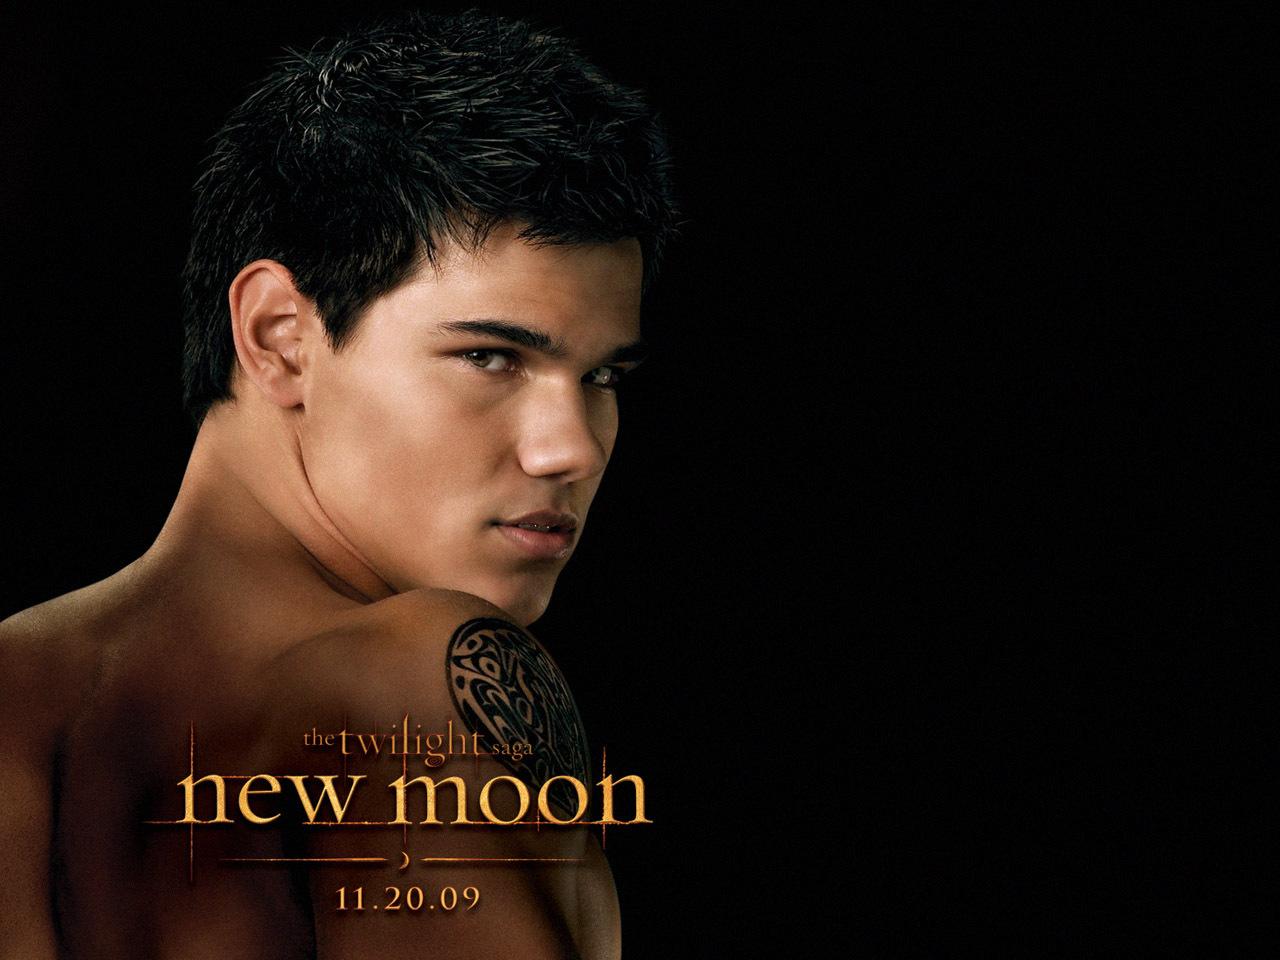 Taylor-Lautner-Twilight1-03.jpg